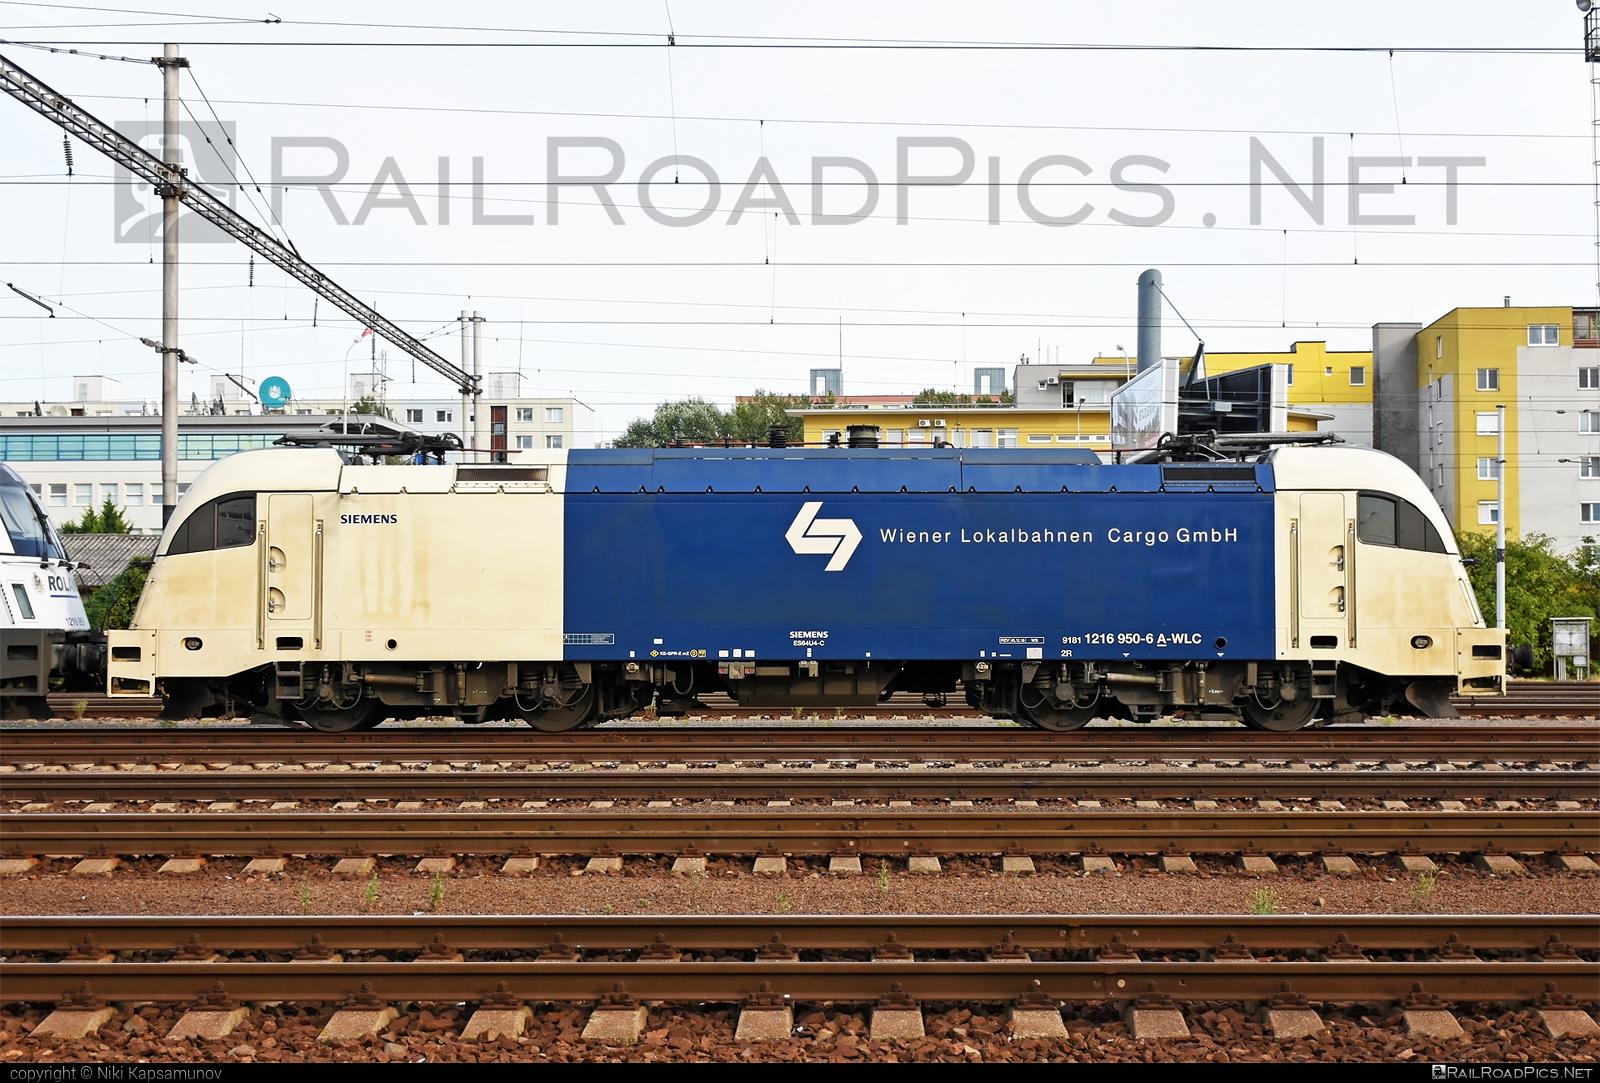 Siemens ES 64 U4 - 1216 950 operated by Wiener Lokalbahnen Cargo GmbH #es64 #es64u #es64u4 #eurosprinter #siemens #siemenses64 #siemenses64u #siemenses64u4 #siemenstaurus #taurus #tauruslocomotive #wienerlokalbahnencargo #wienerlokalbahnencargogmbh #wlc